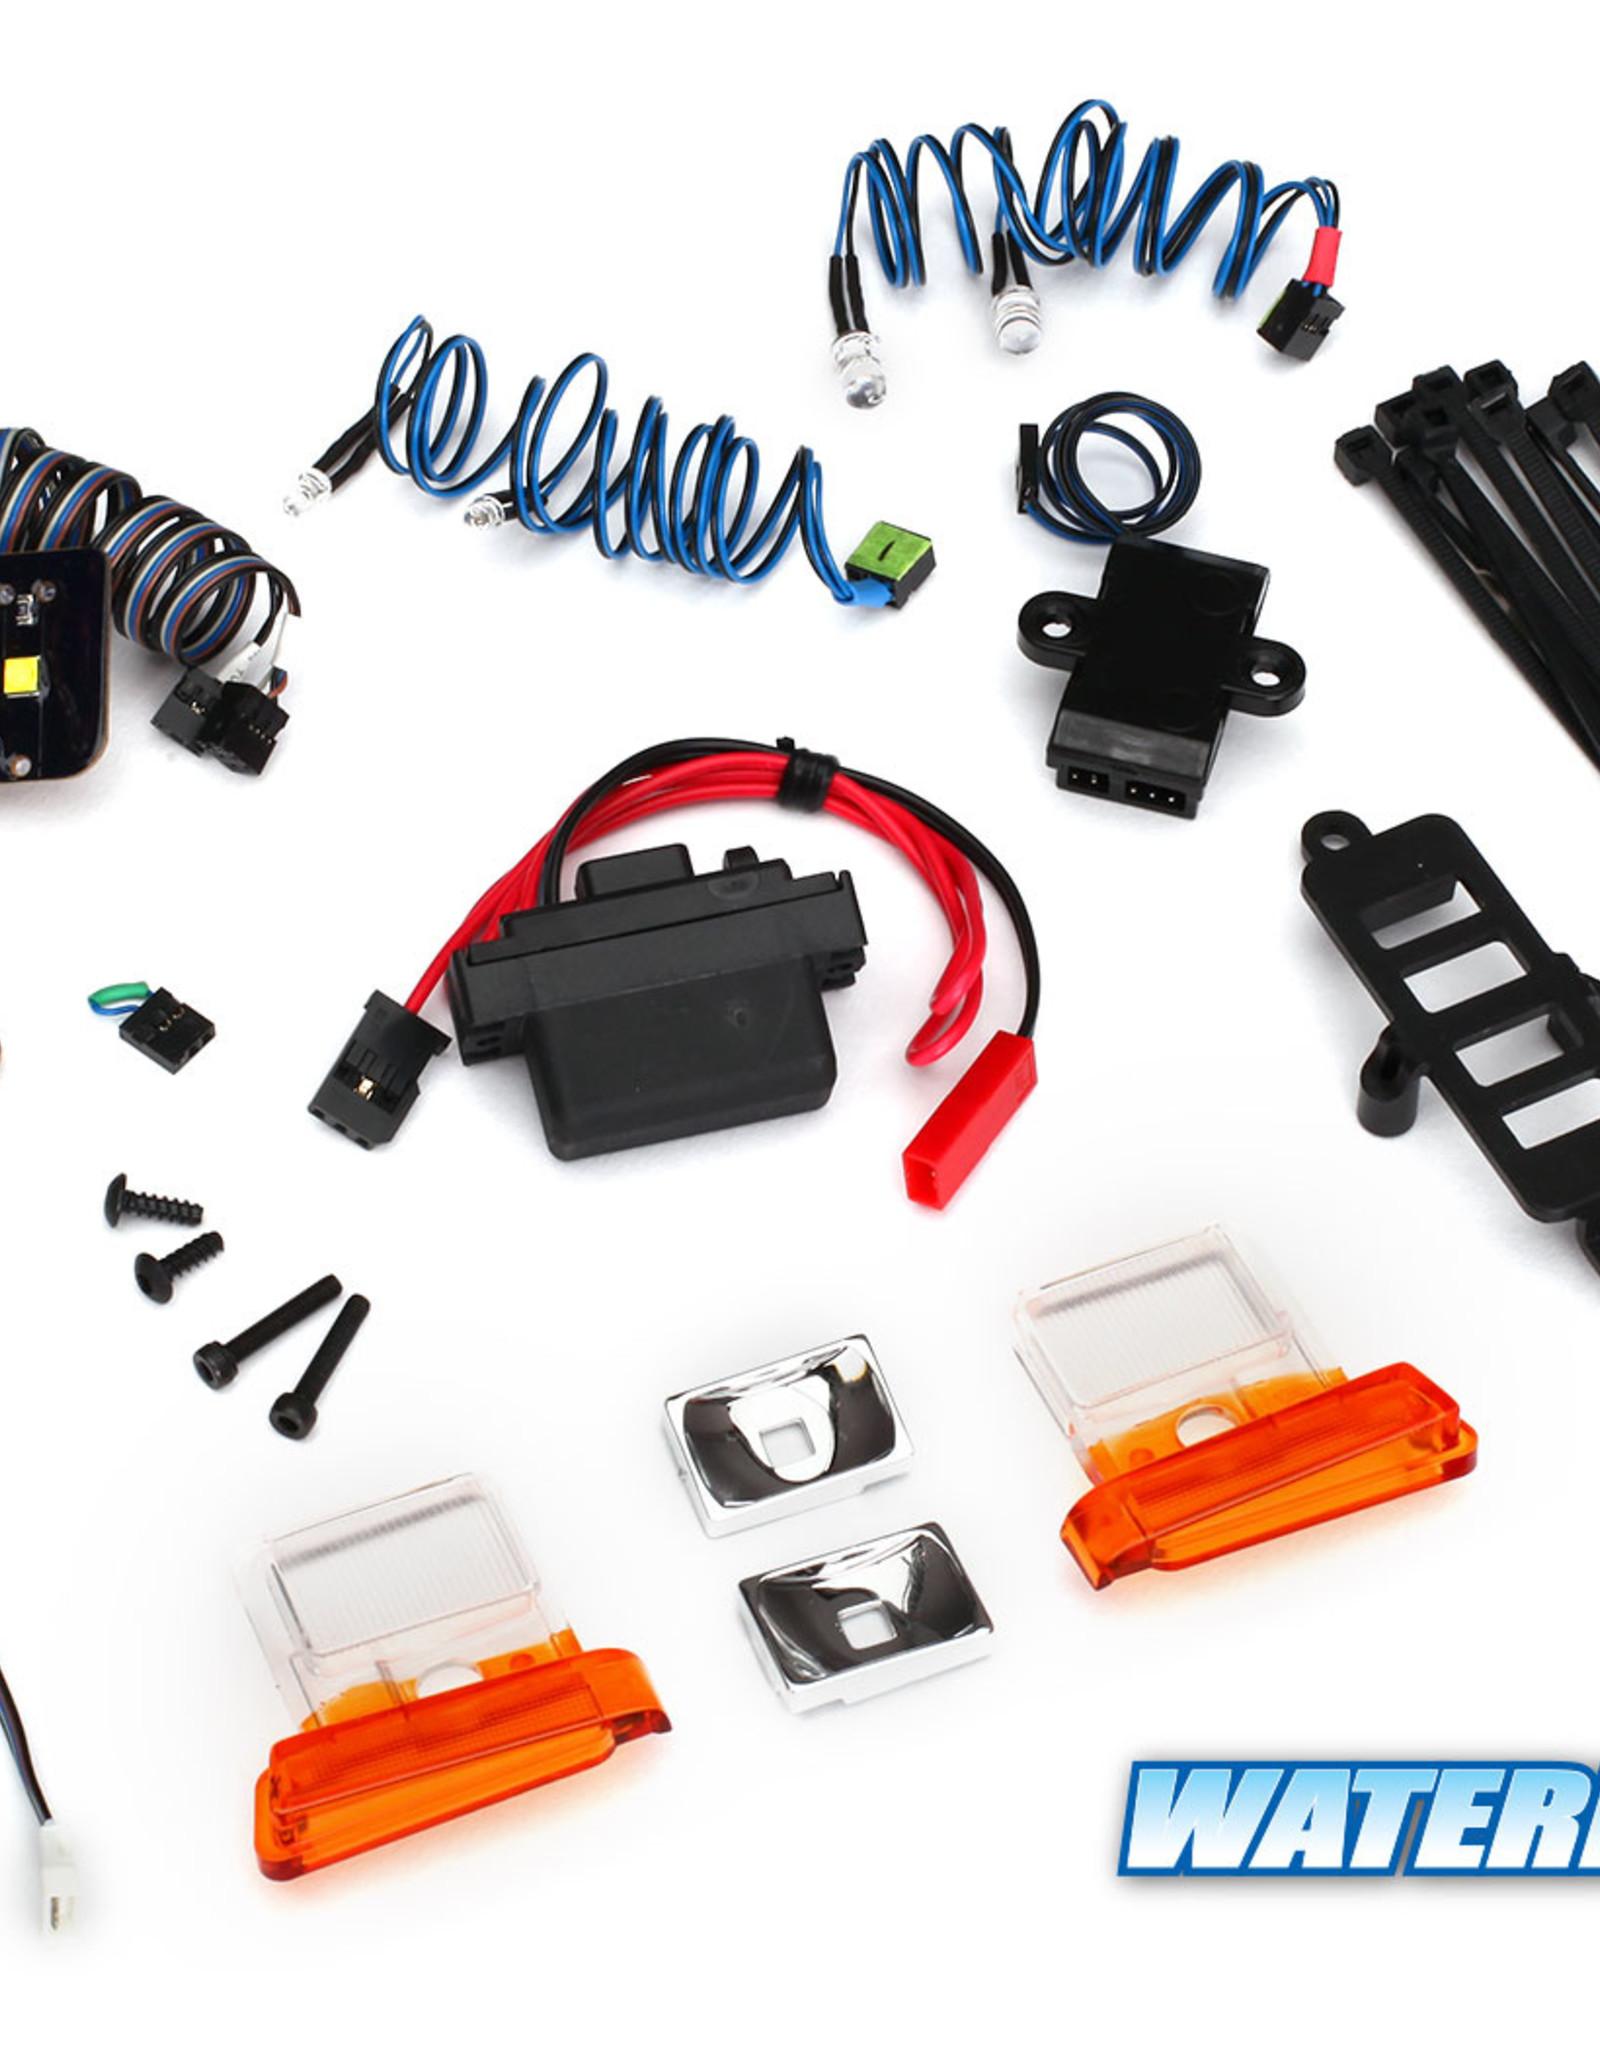 Traxxas TRX4 Bronco Complete Light Kit